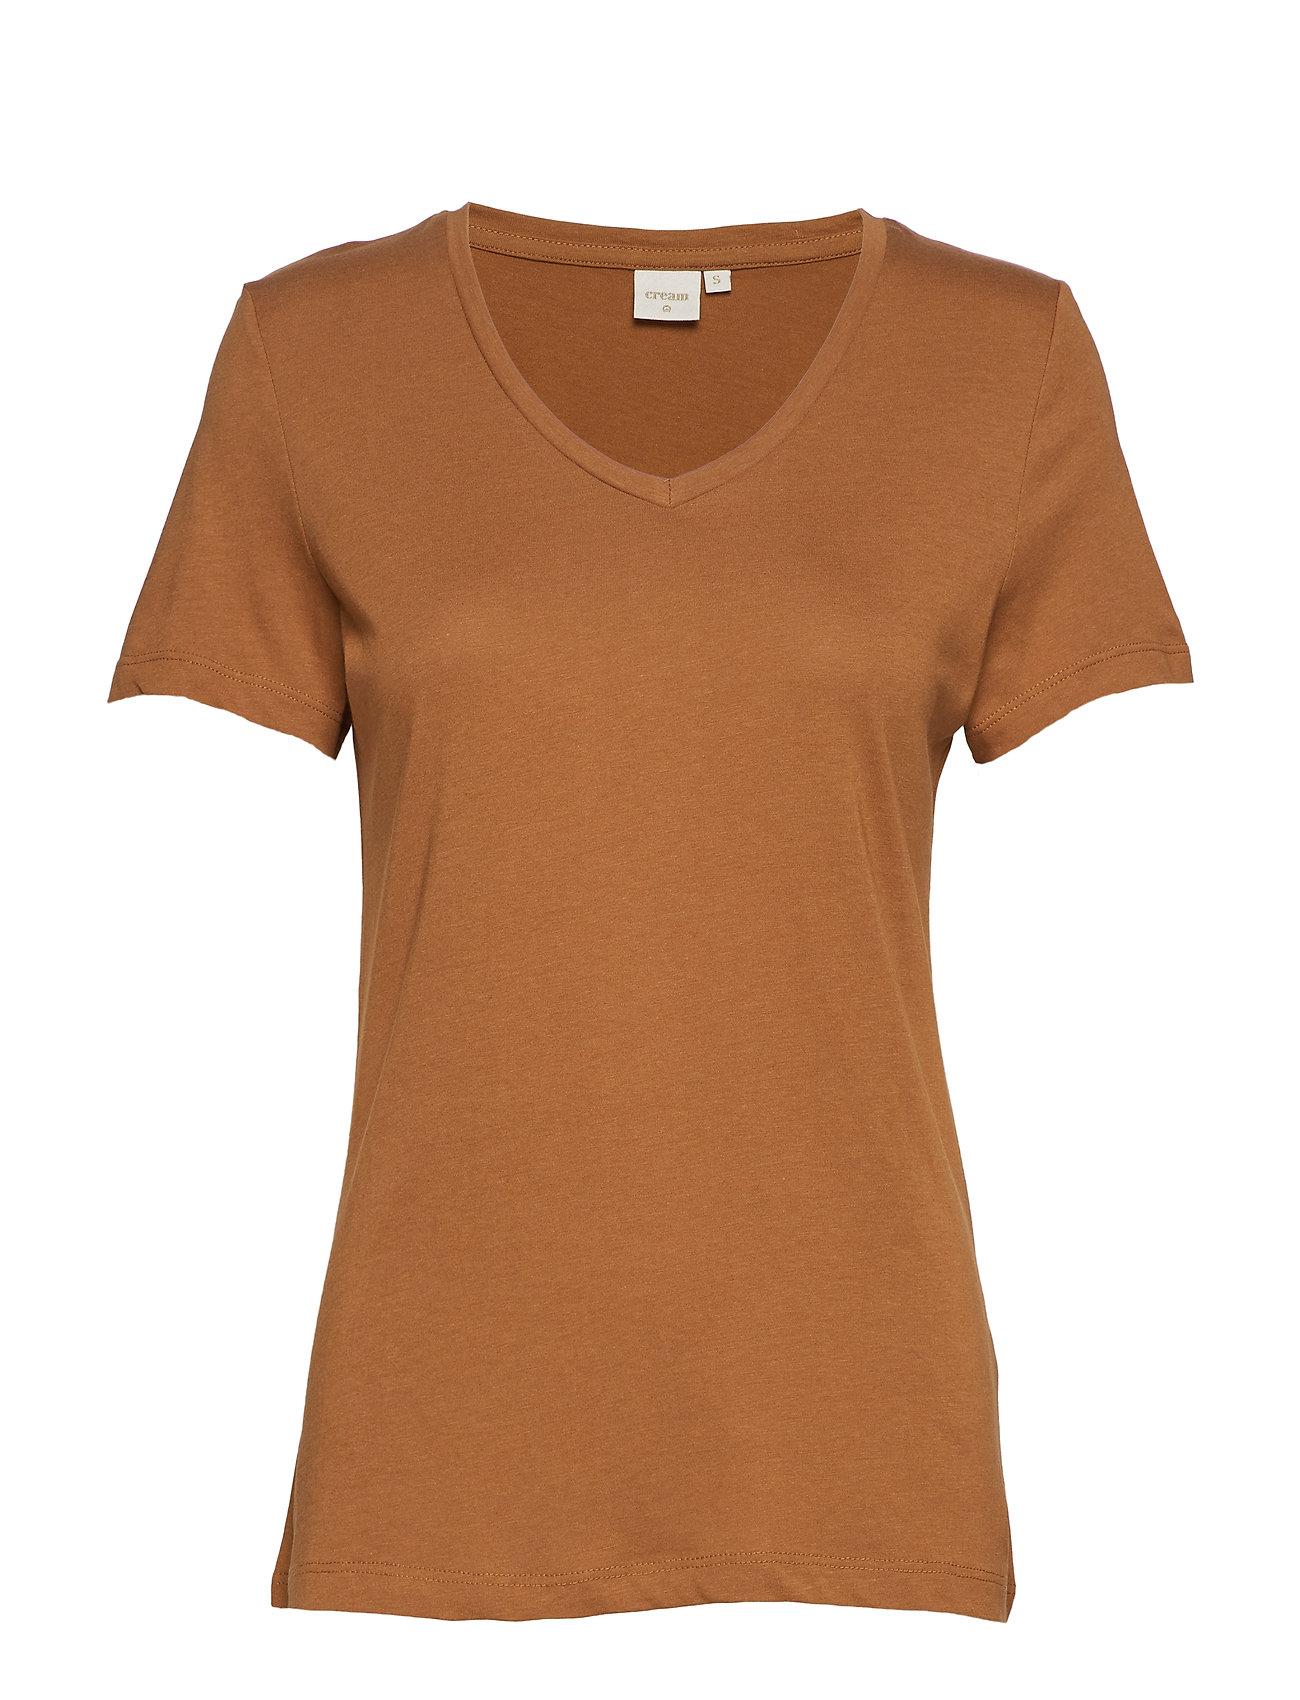 Cream Naia T-shirt BCI - BRONZED